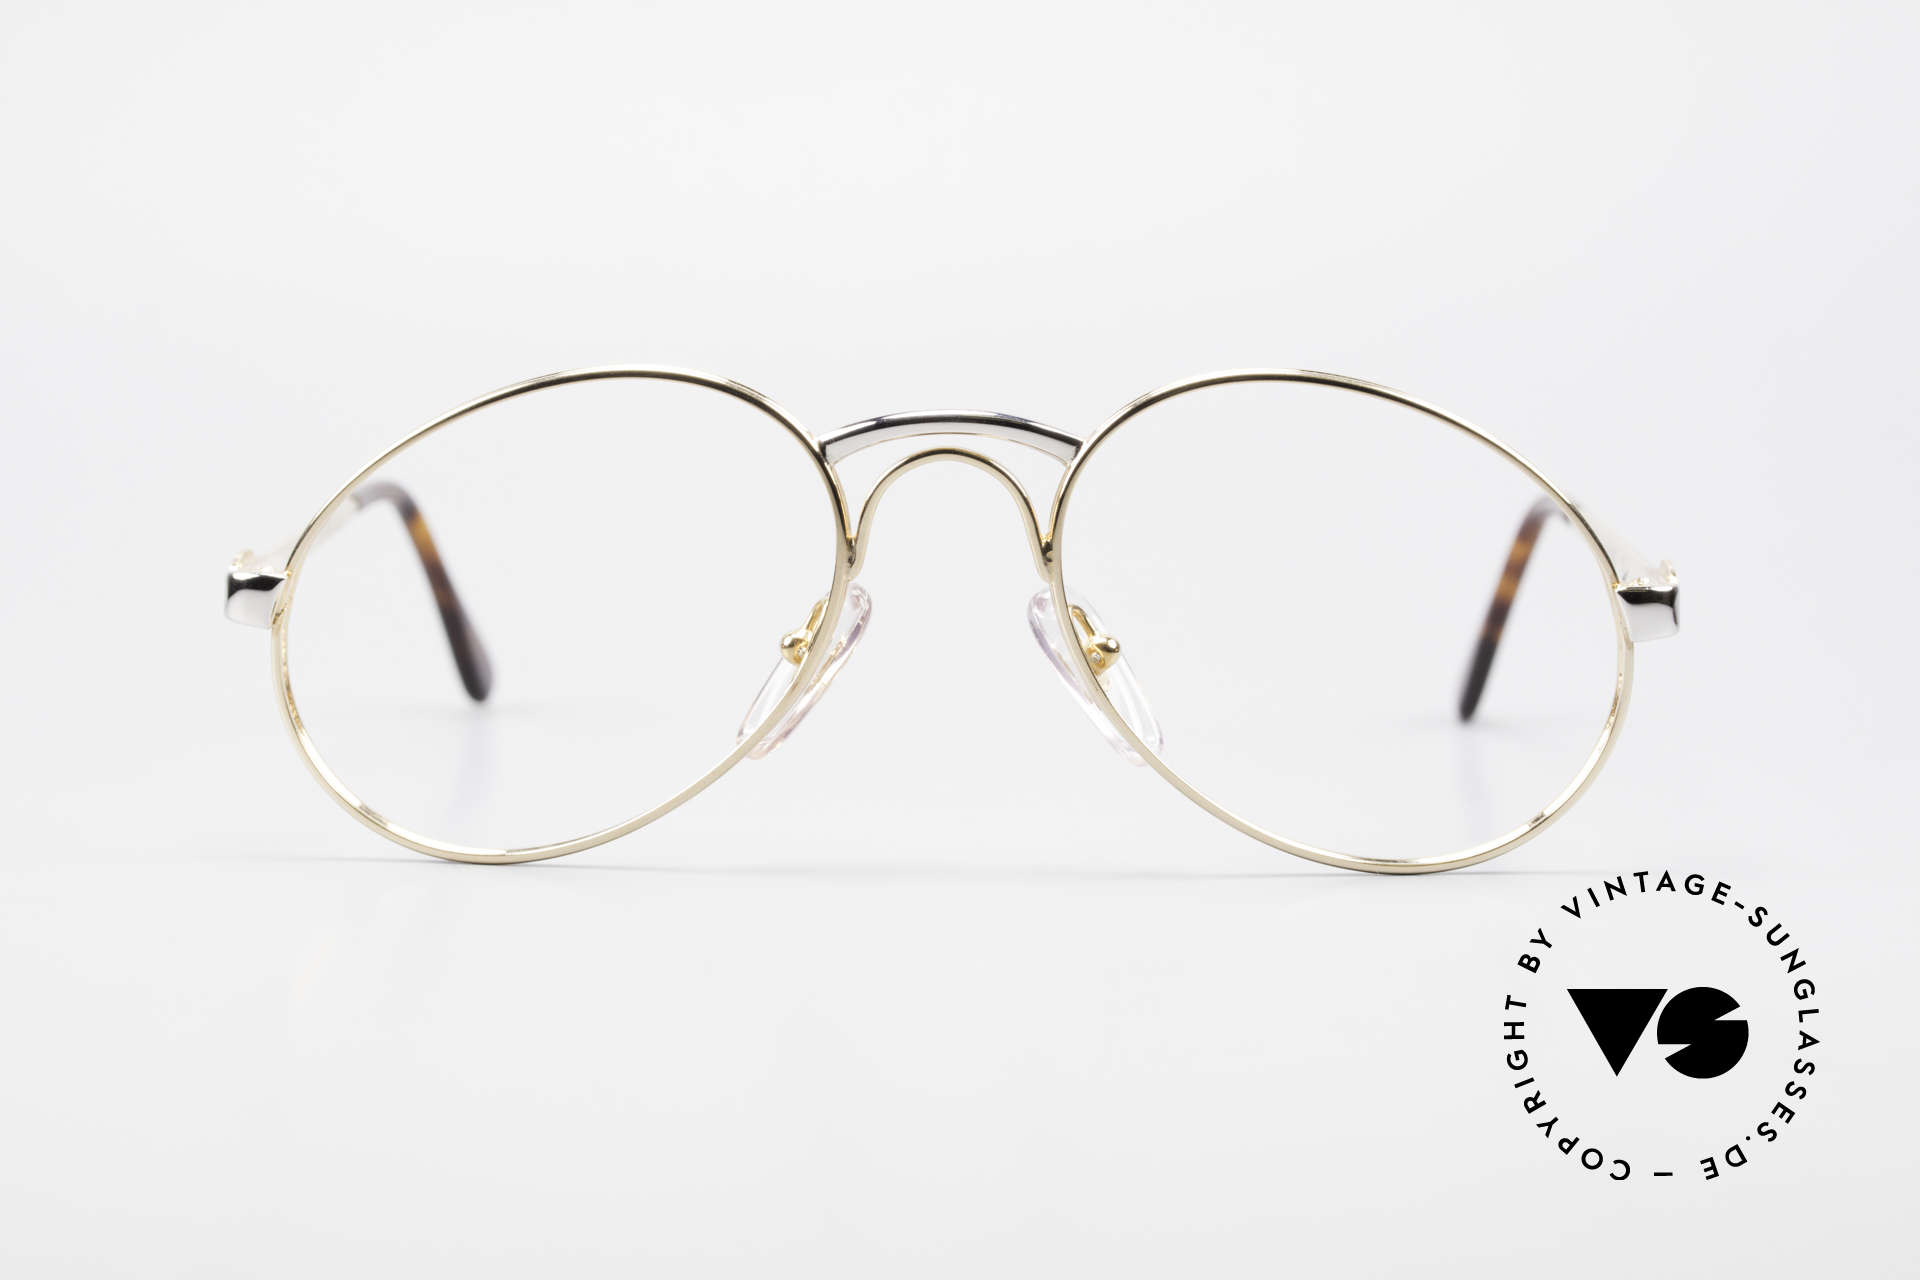 Bugatti 03308 Men's 80's Glasses With Clip On, Size: medium, Made for Men